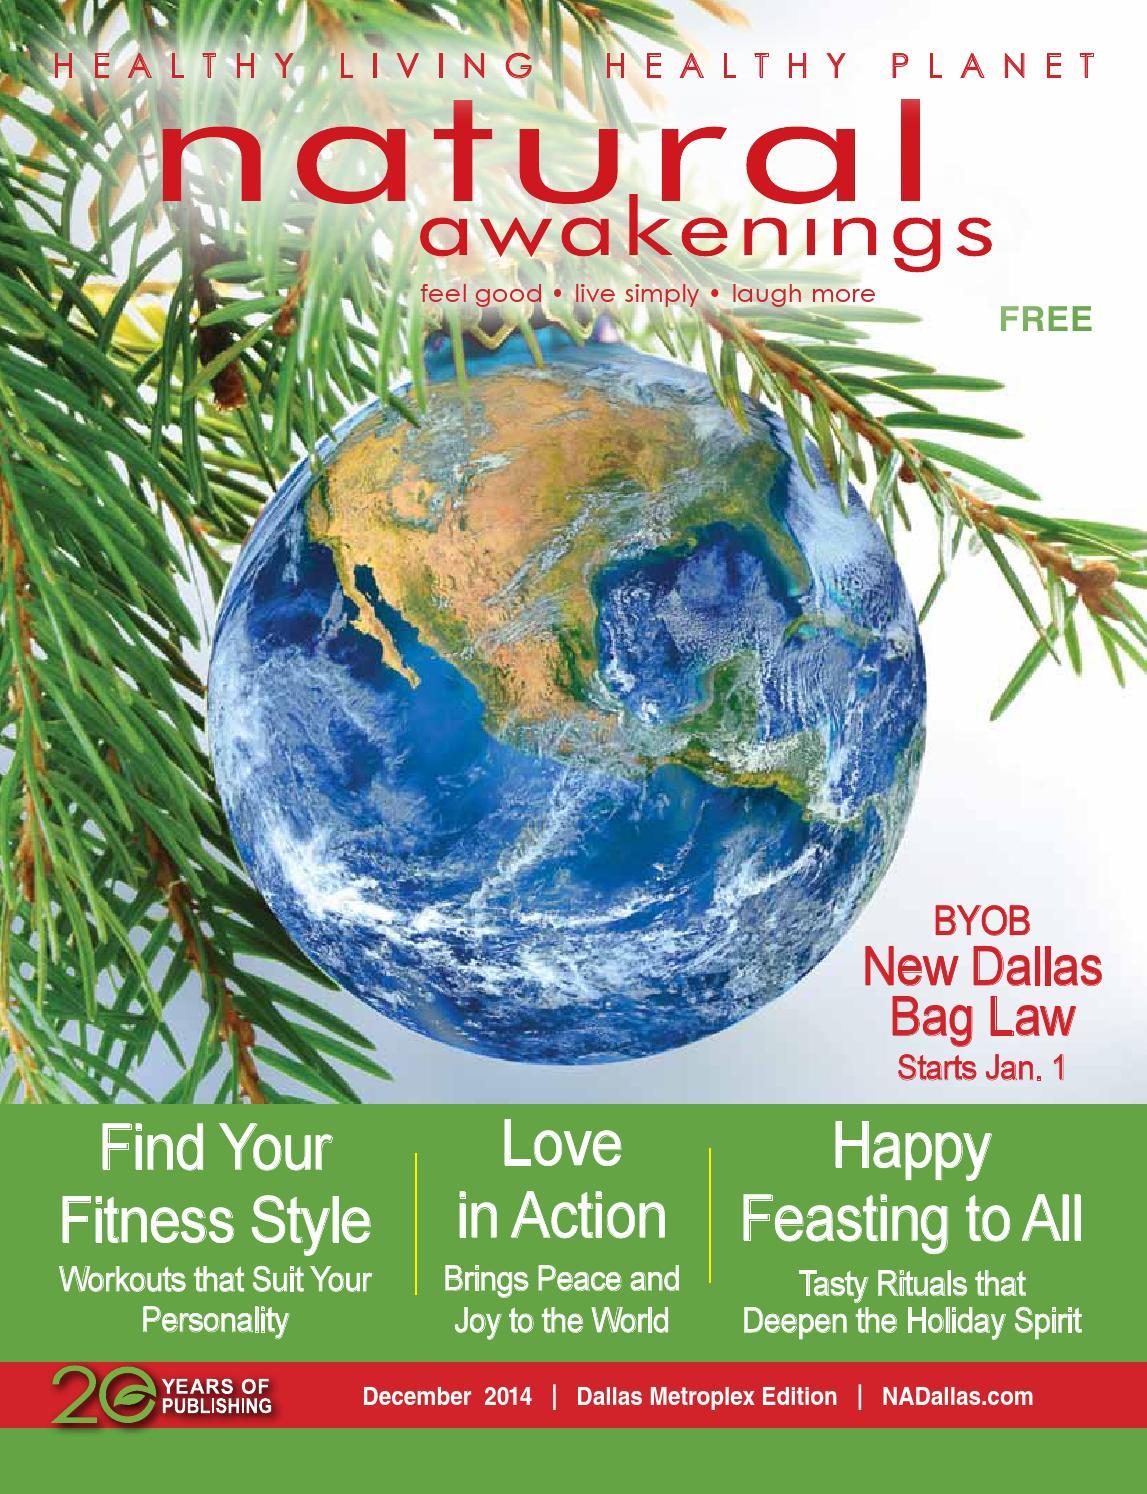 Natural awakenings dallas metro dec 2014 by Natural Awakenings ...